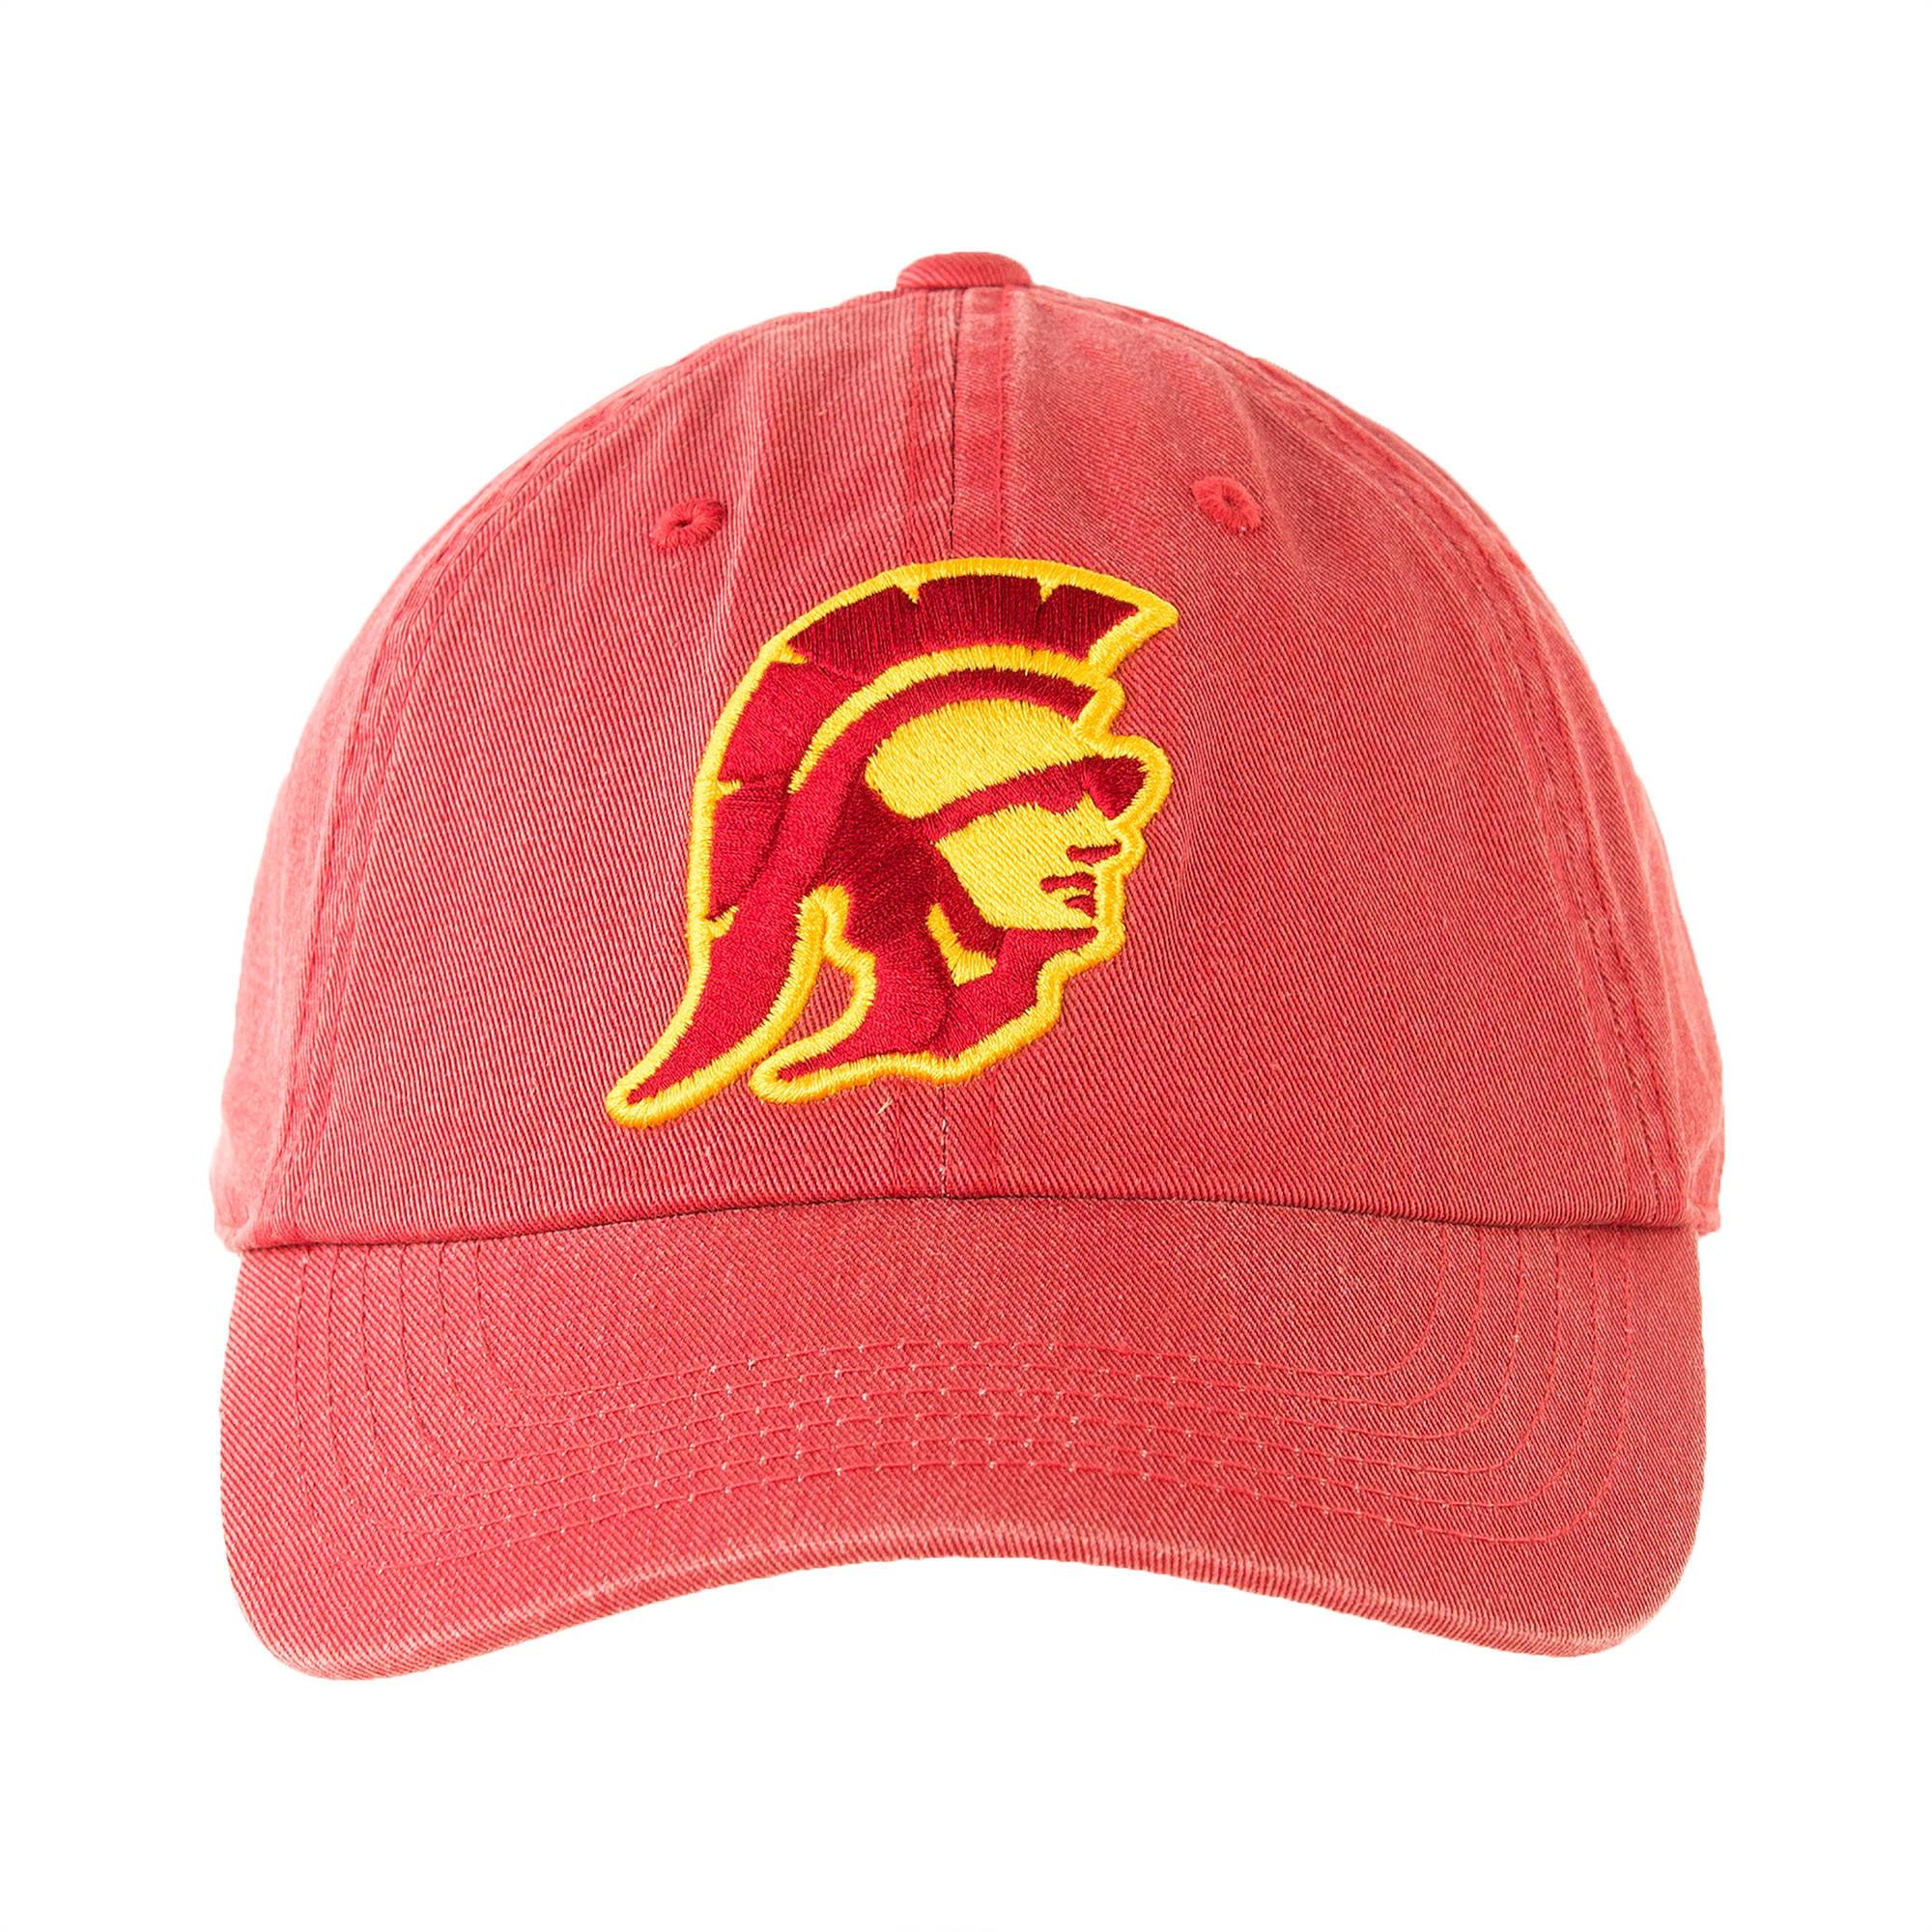 NCAA USC Trojans Adjustable Cap